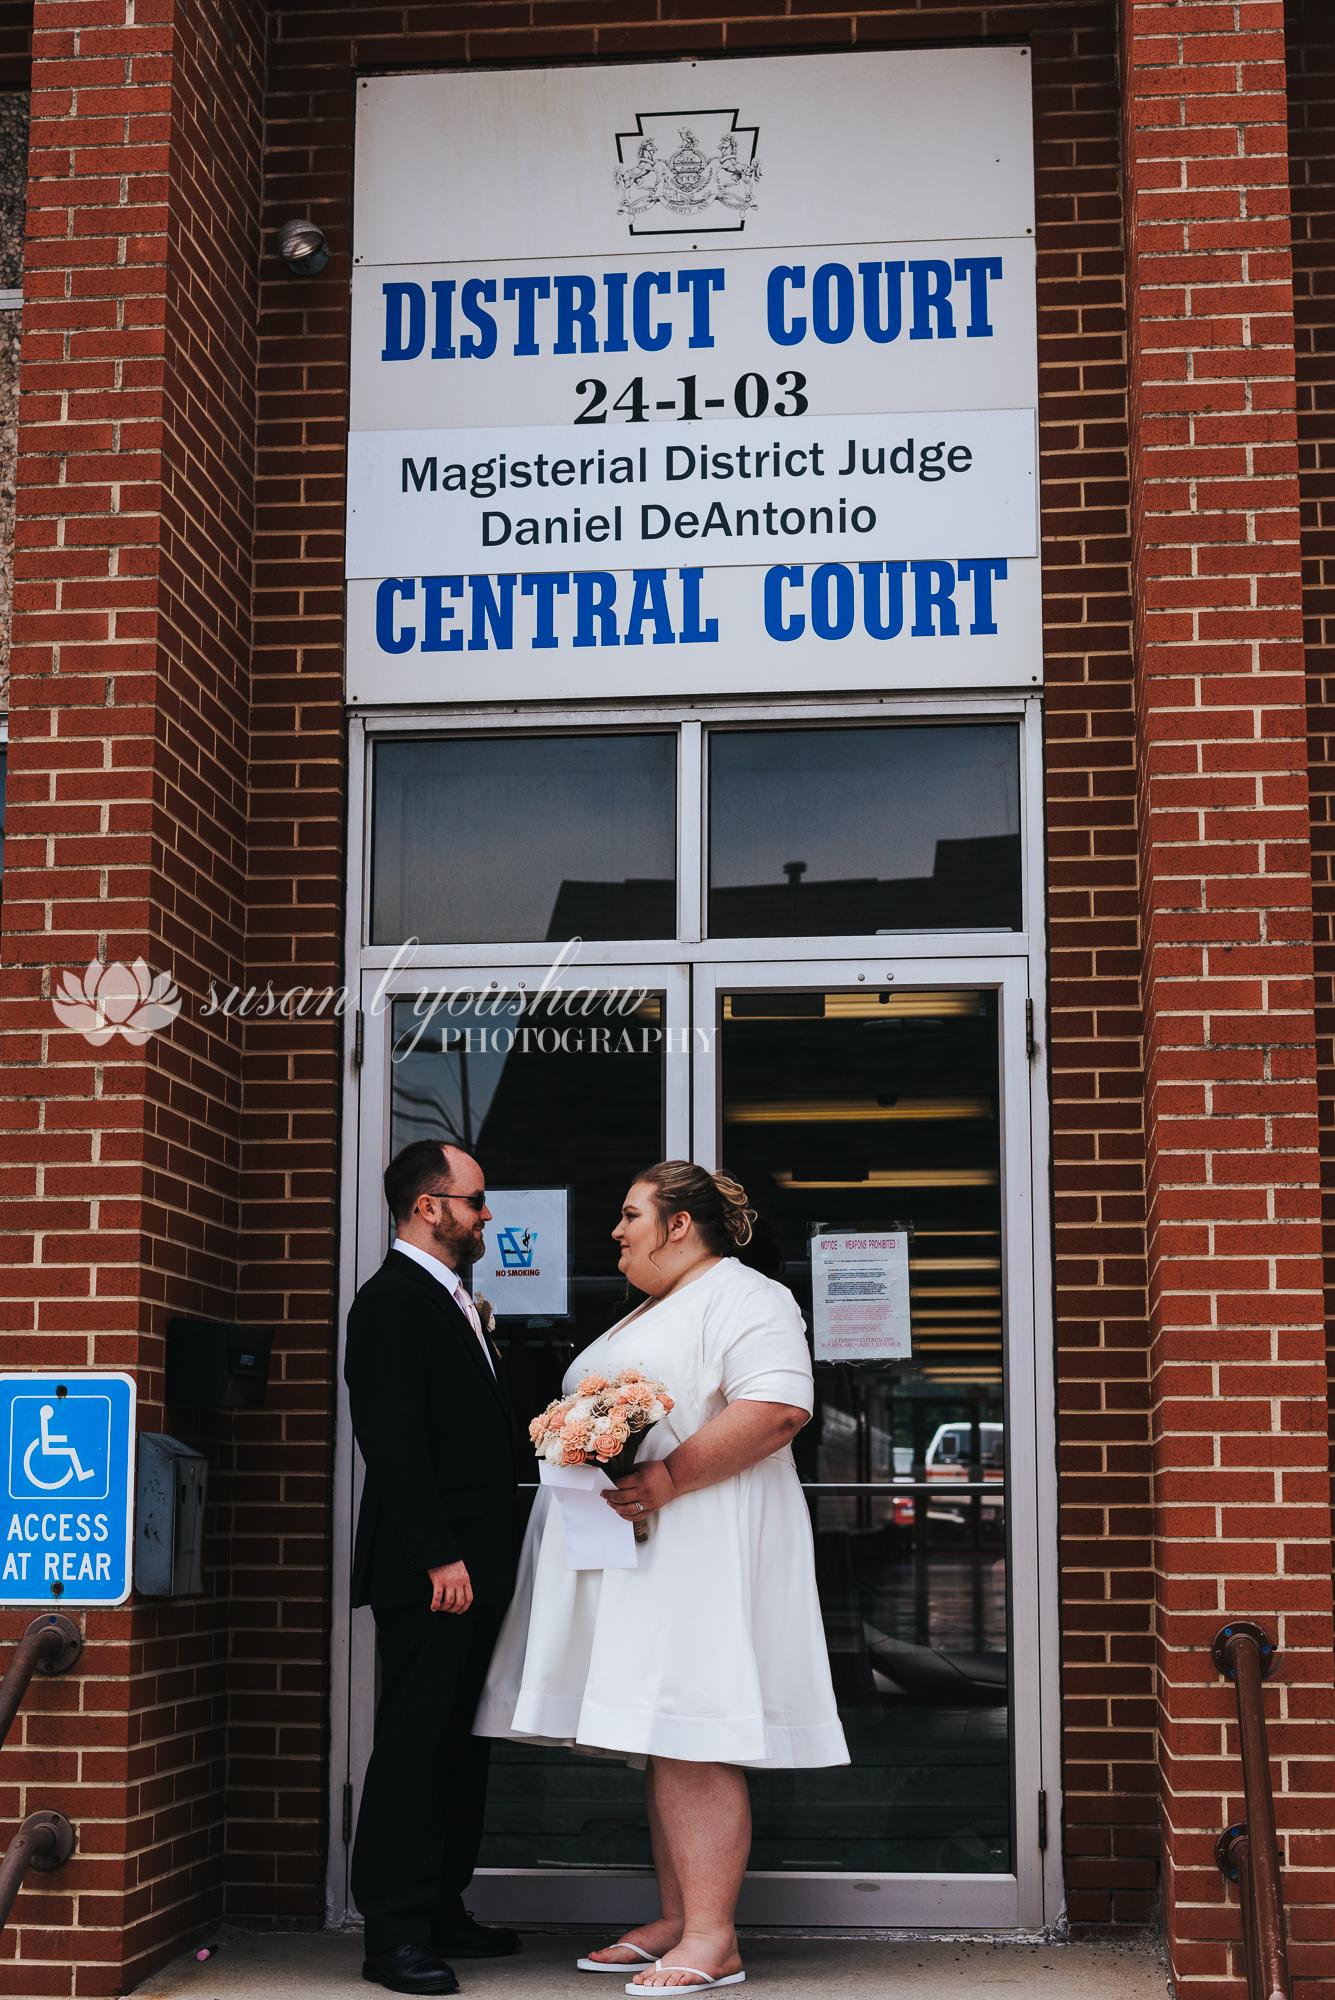 Bill and Sarah Wedding Photos 06-08-2019 SLY Photography -37.jpg